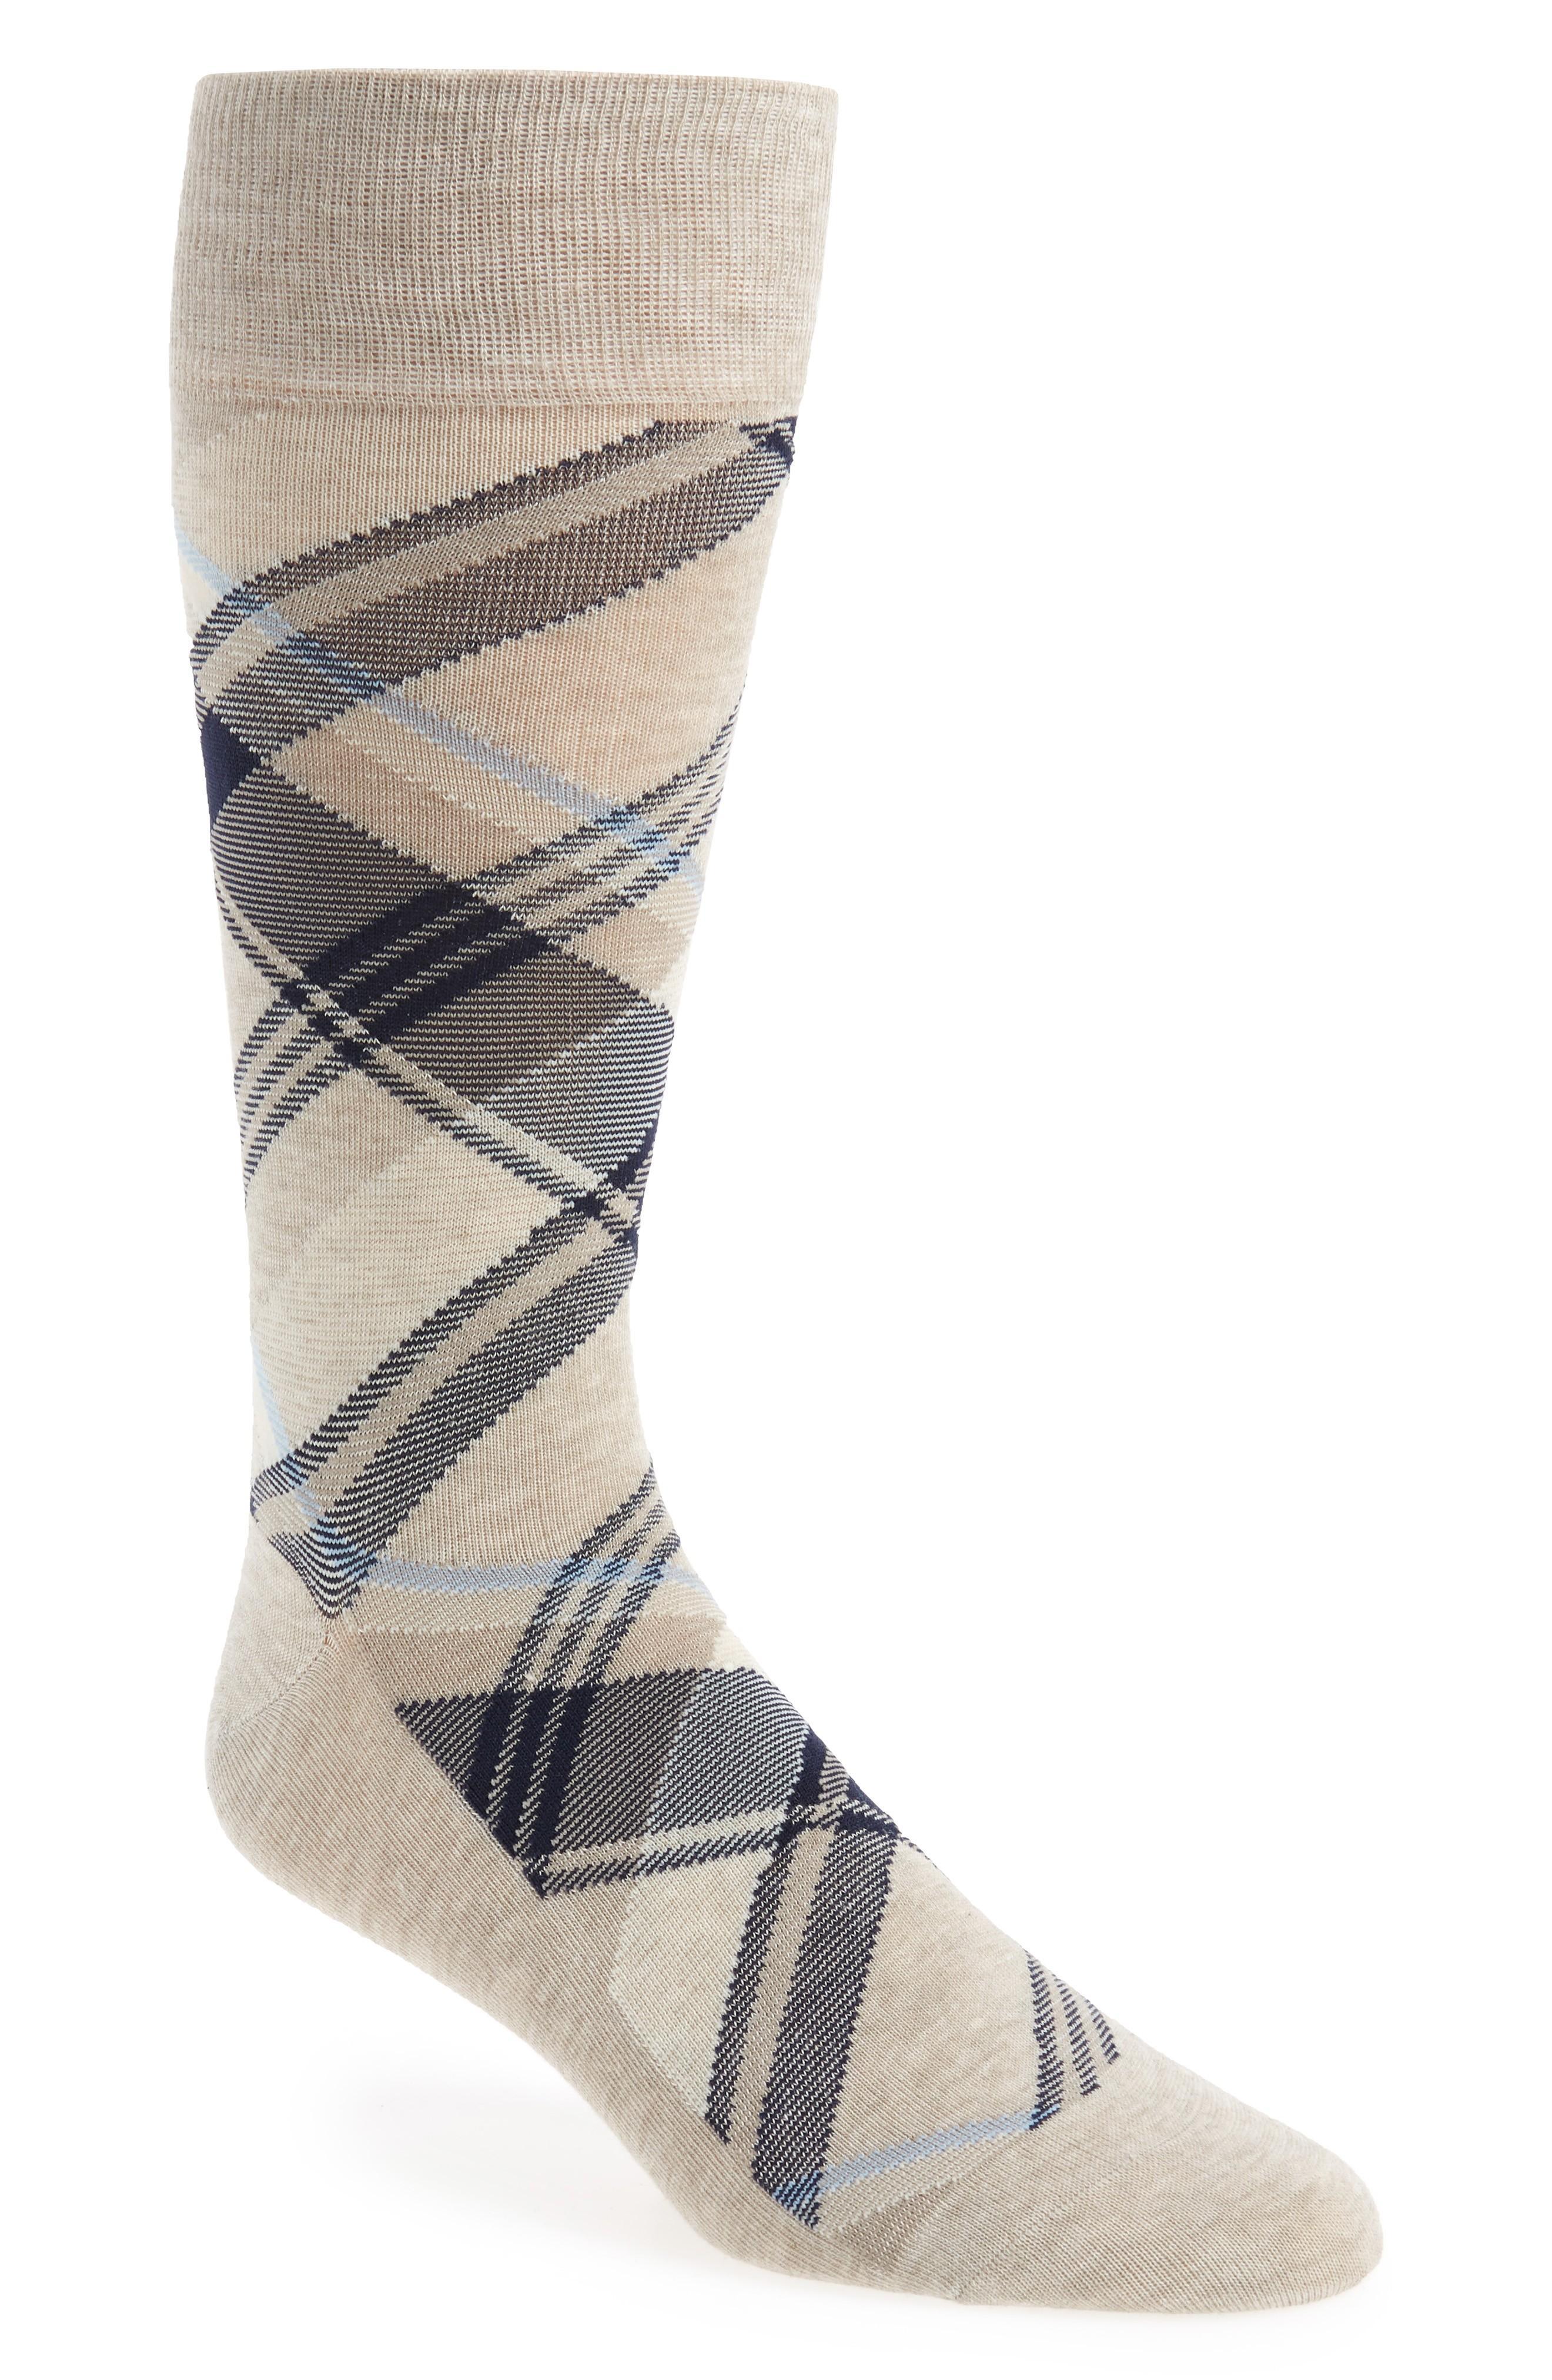 Cole Haan Men's Diagonal Plaid Crew Socks In Oatmeal Heather